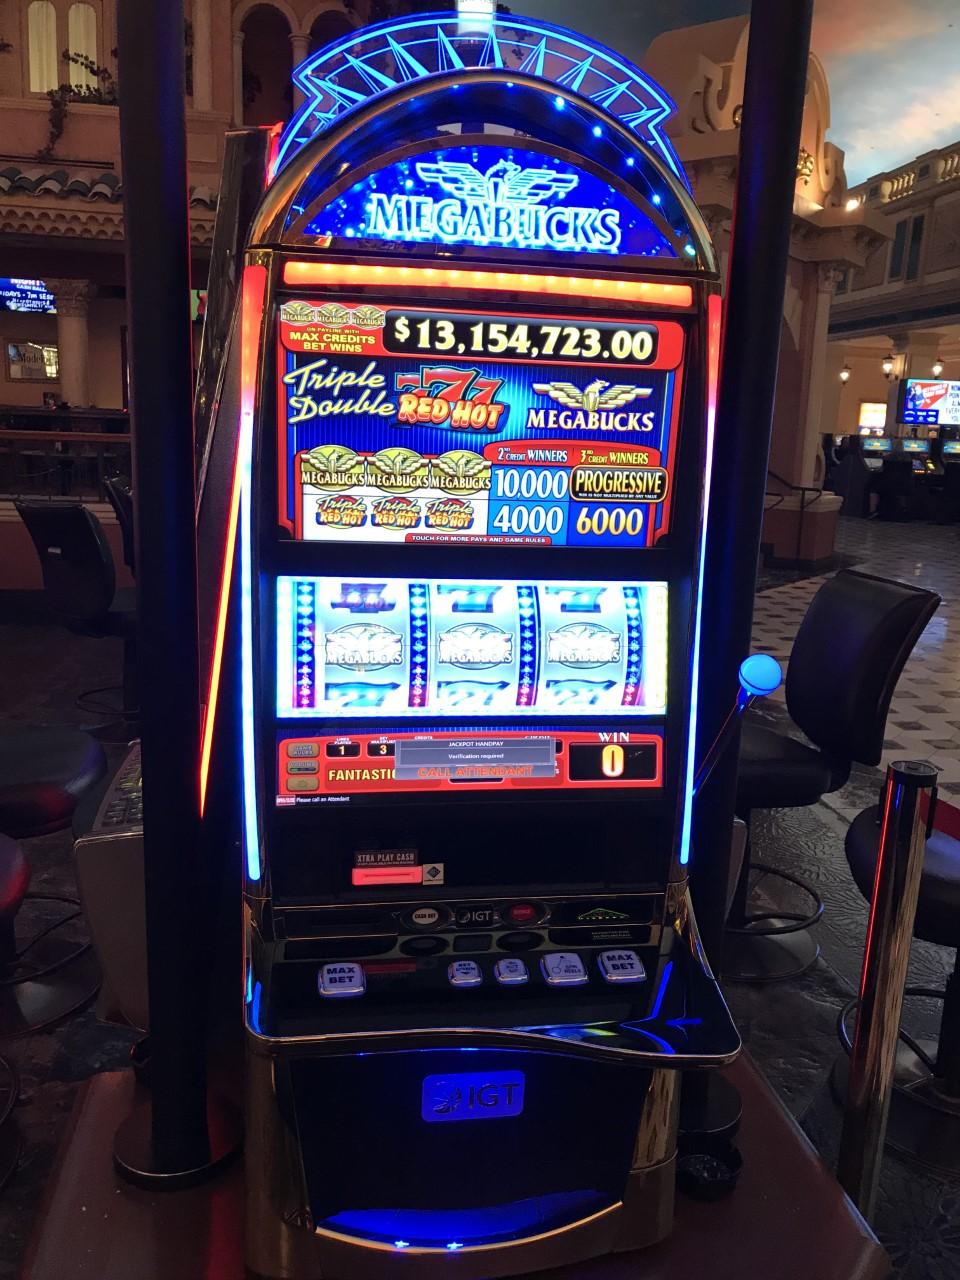 Texas gambling bill